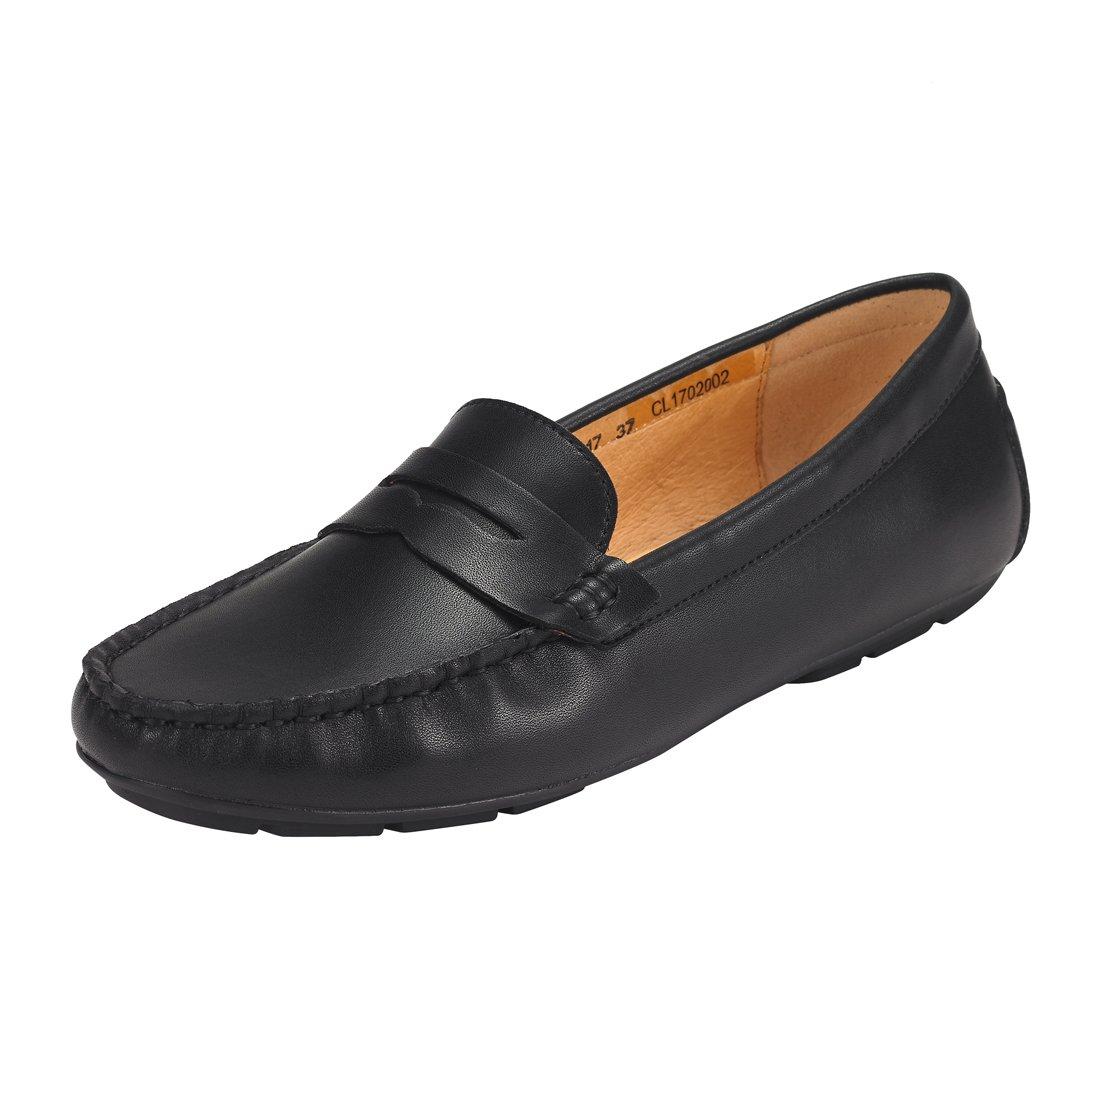 JENN ARDOR Penny Loafers for Women: Vegan Leather Slip-On Comfortable Driving Moccasins Flats-Black